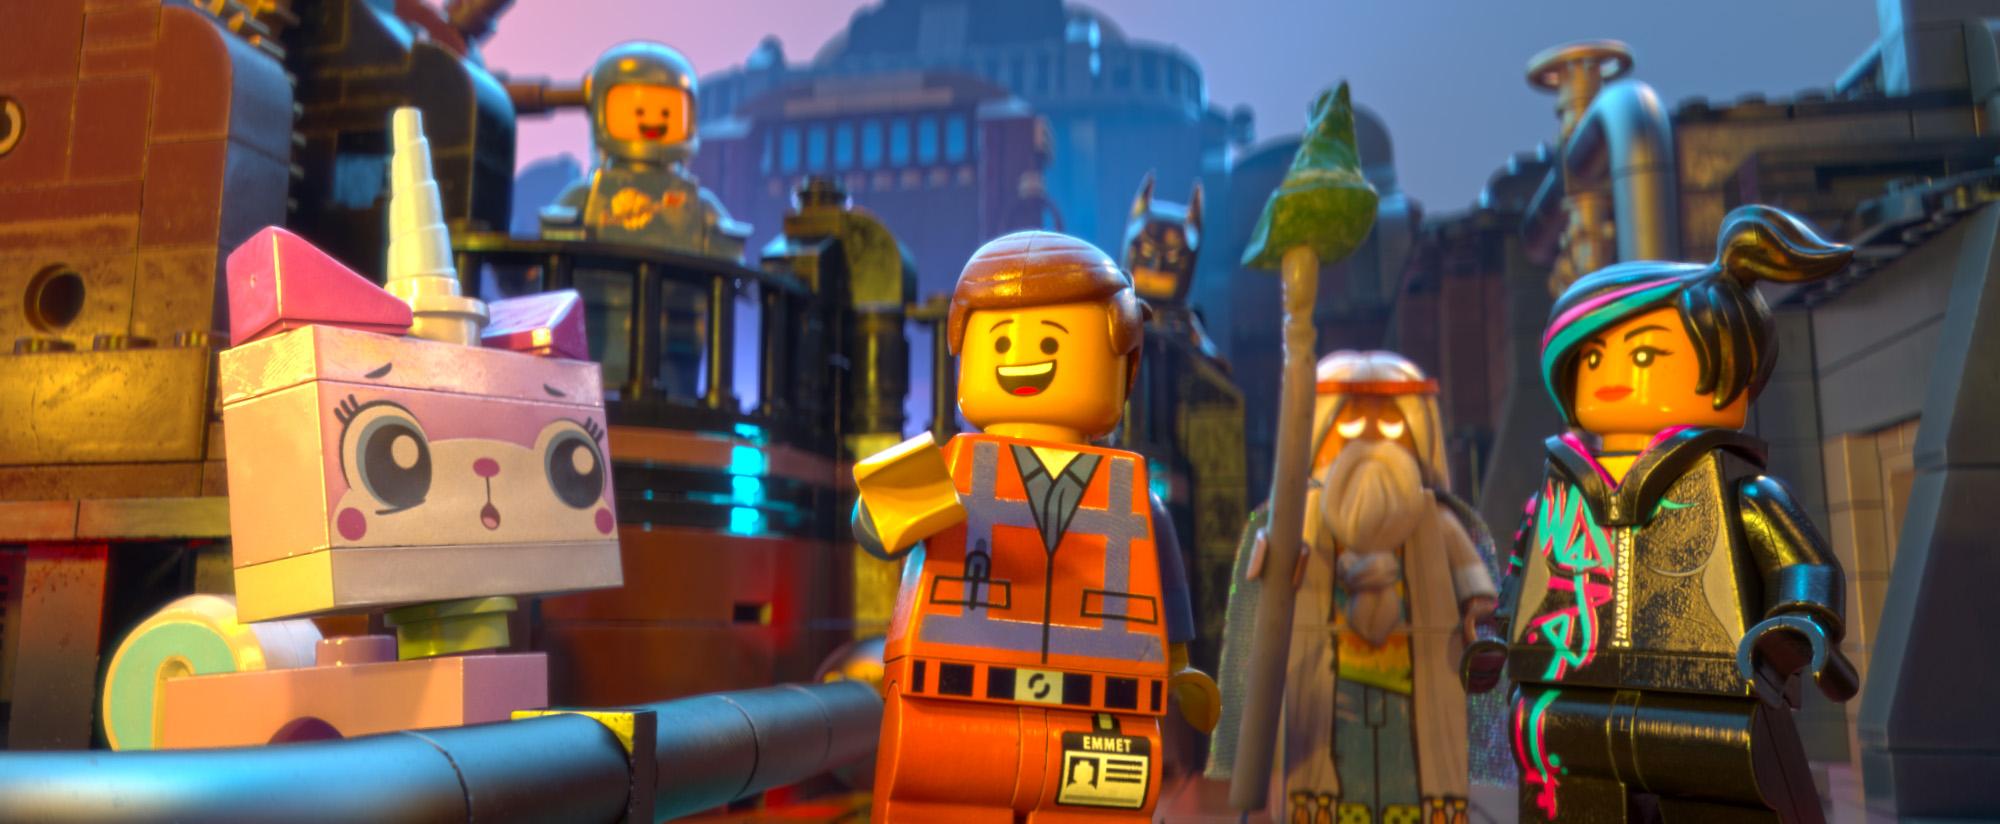 LEGO_jelenetfoto (2).jpg